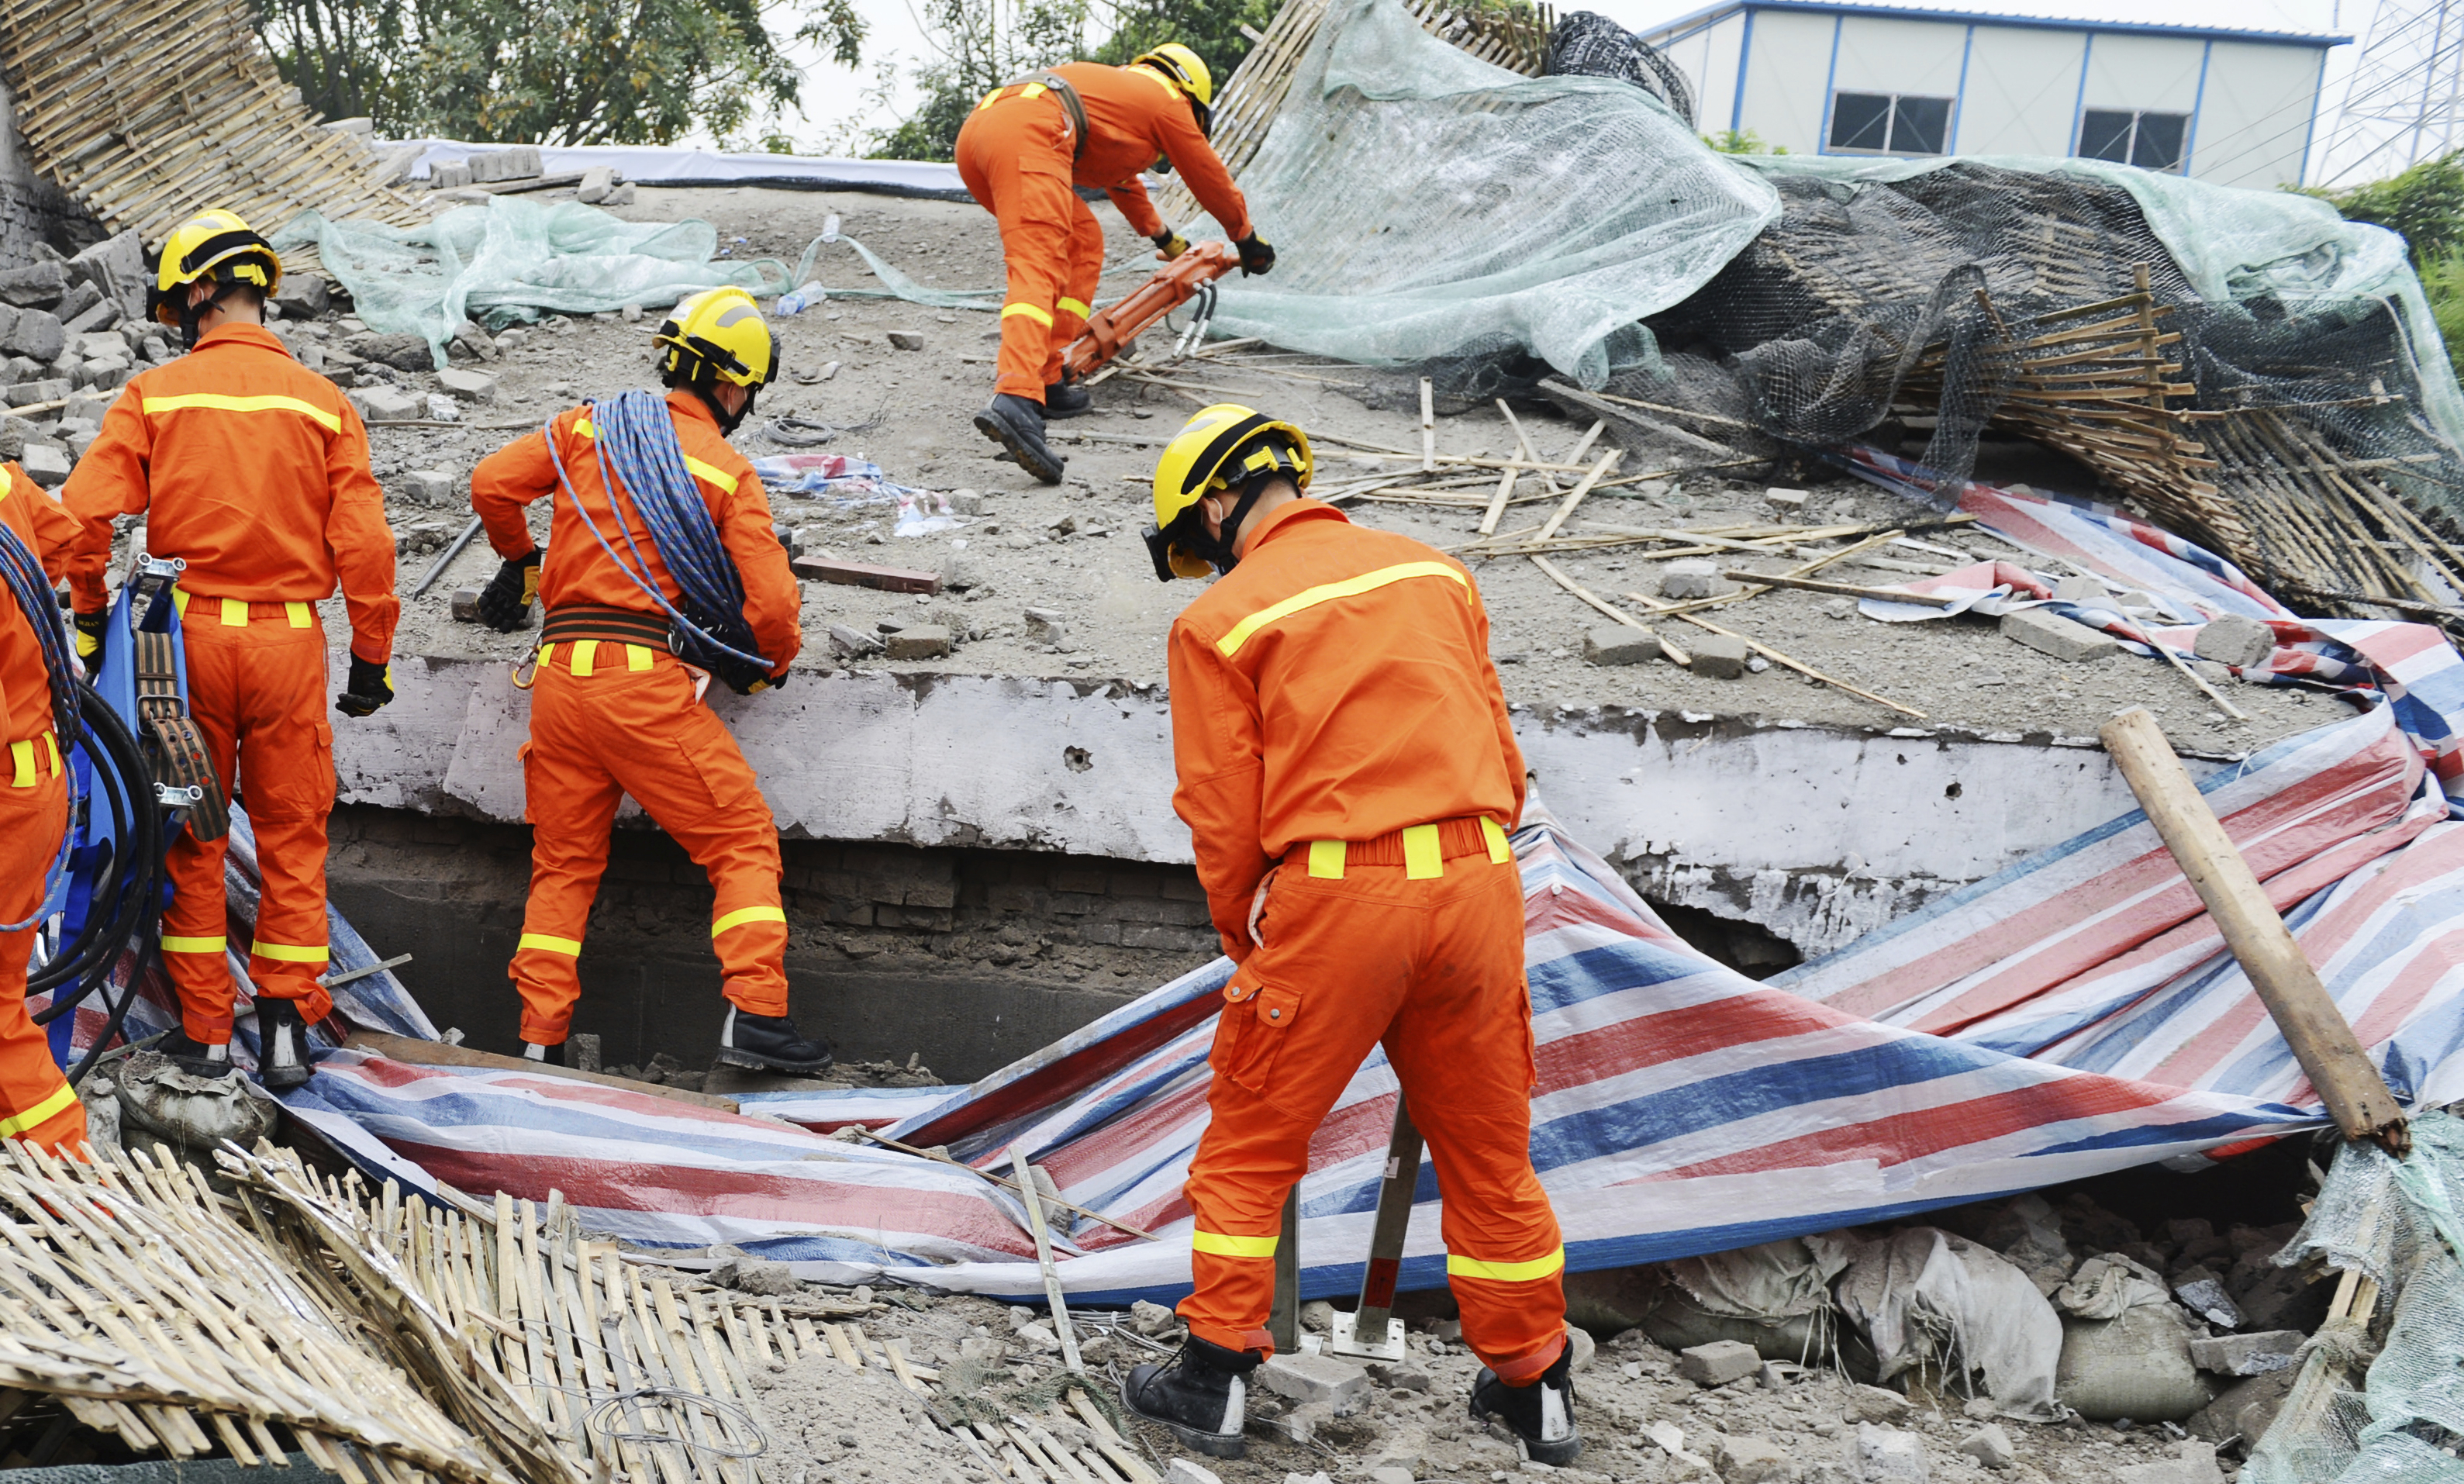 Response worker volunteers working